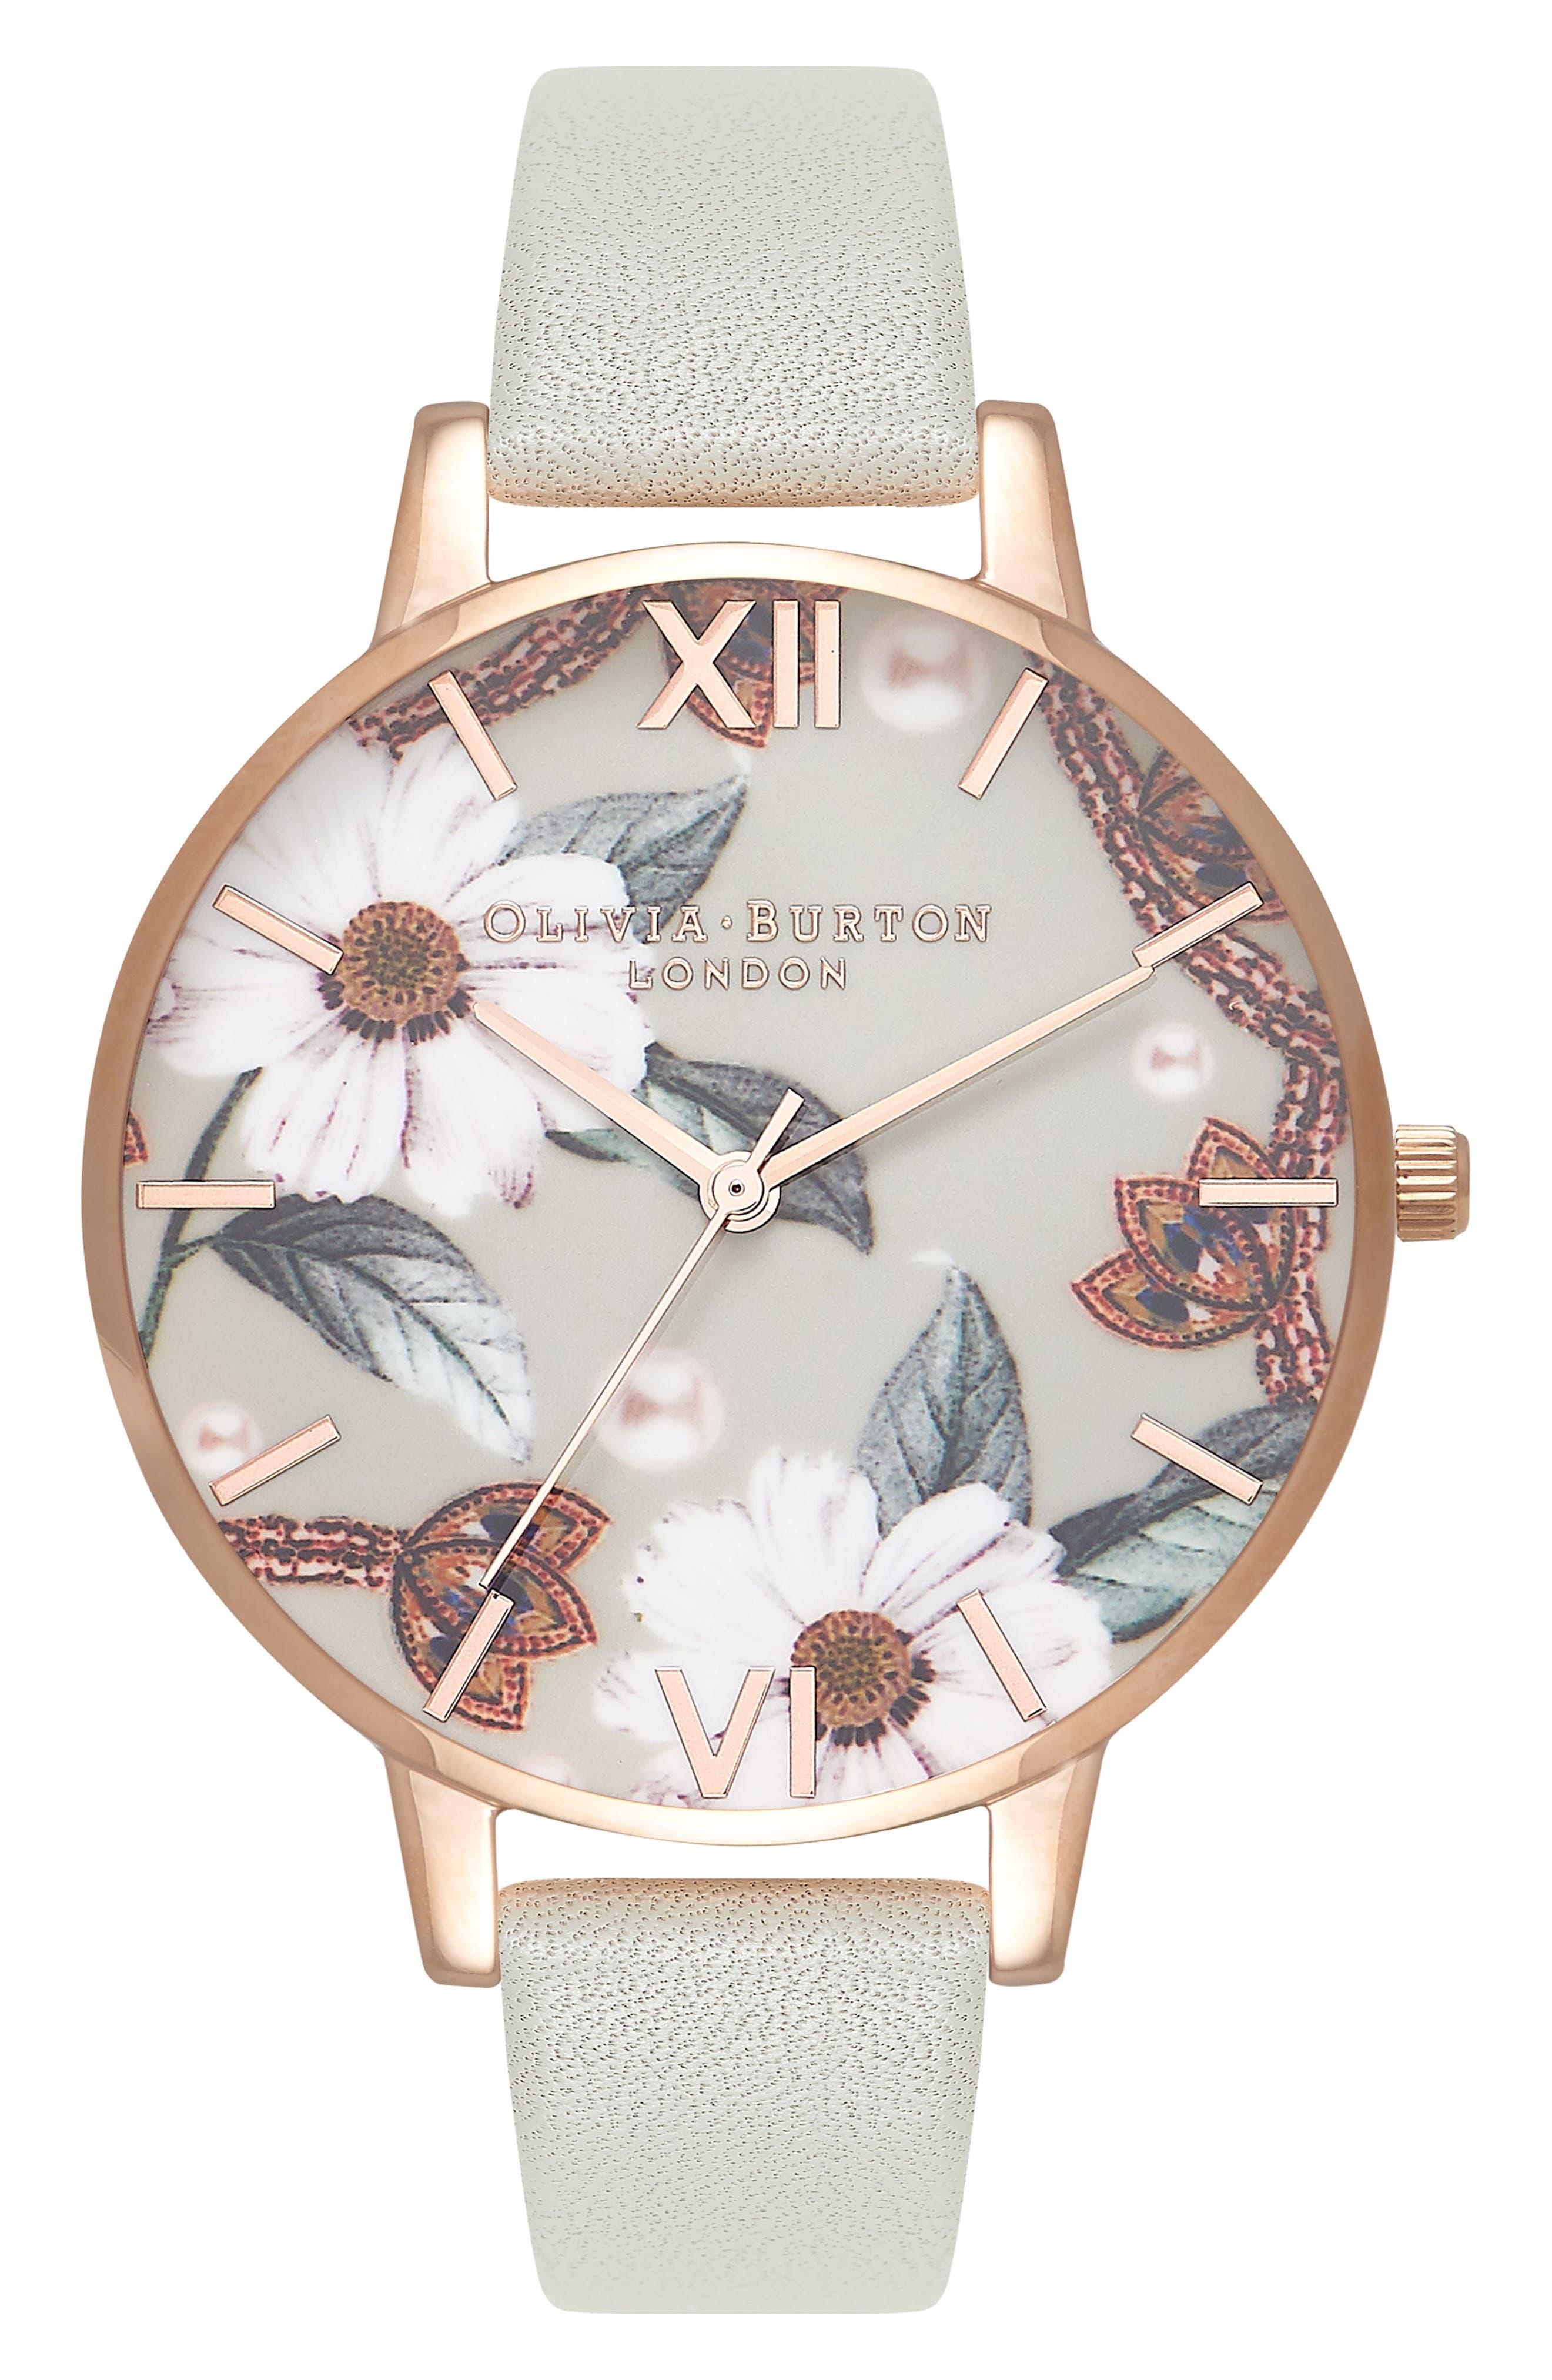 OLIVIA BURTON Bejewelled Leather Strap Watch, 38mm, Main, color, GREY/ FLORAL/ ROSE GOLD